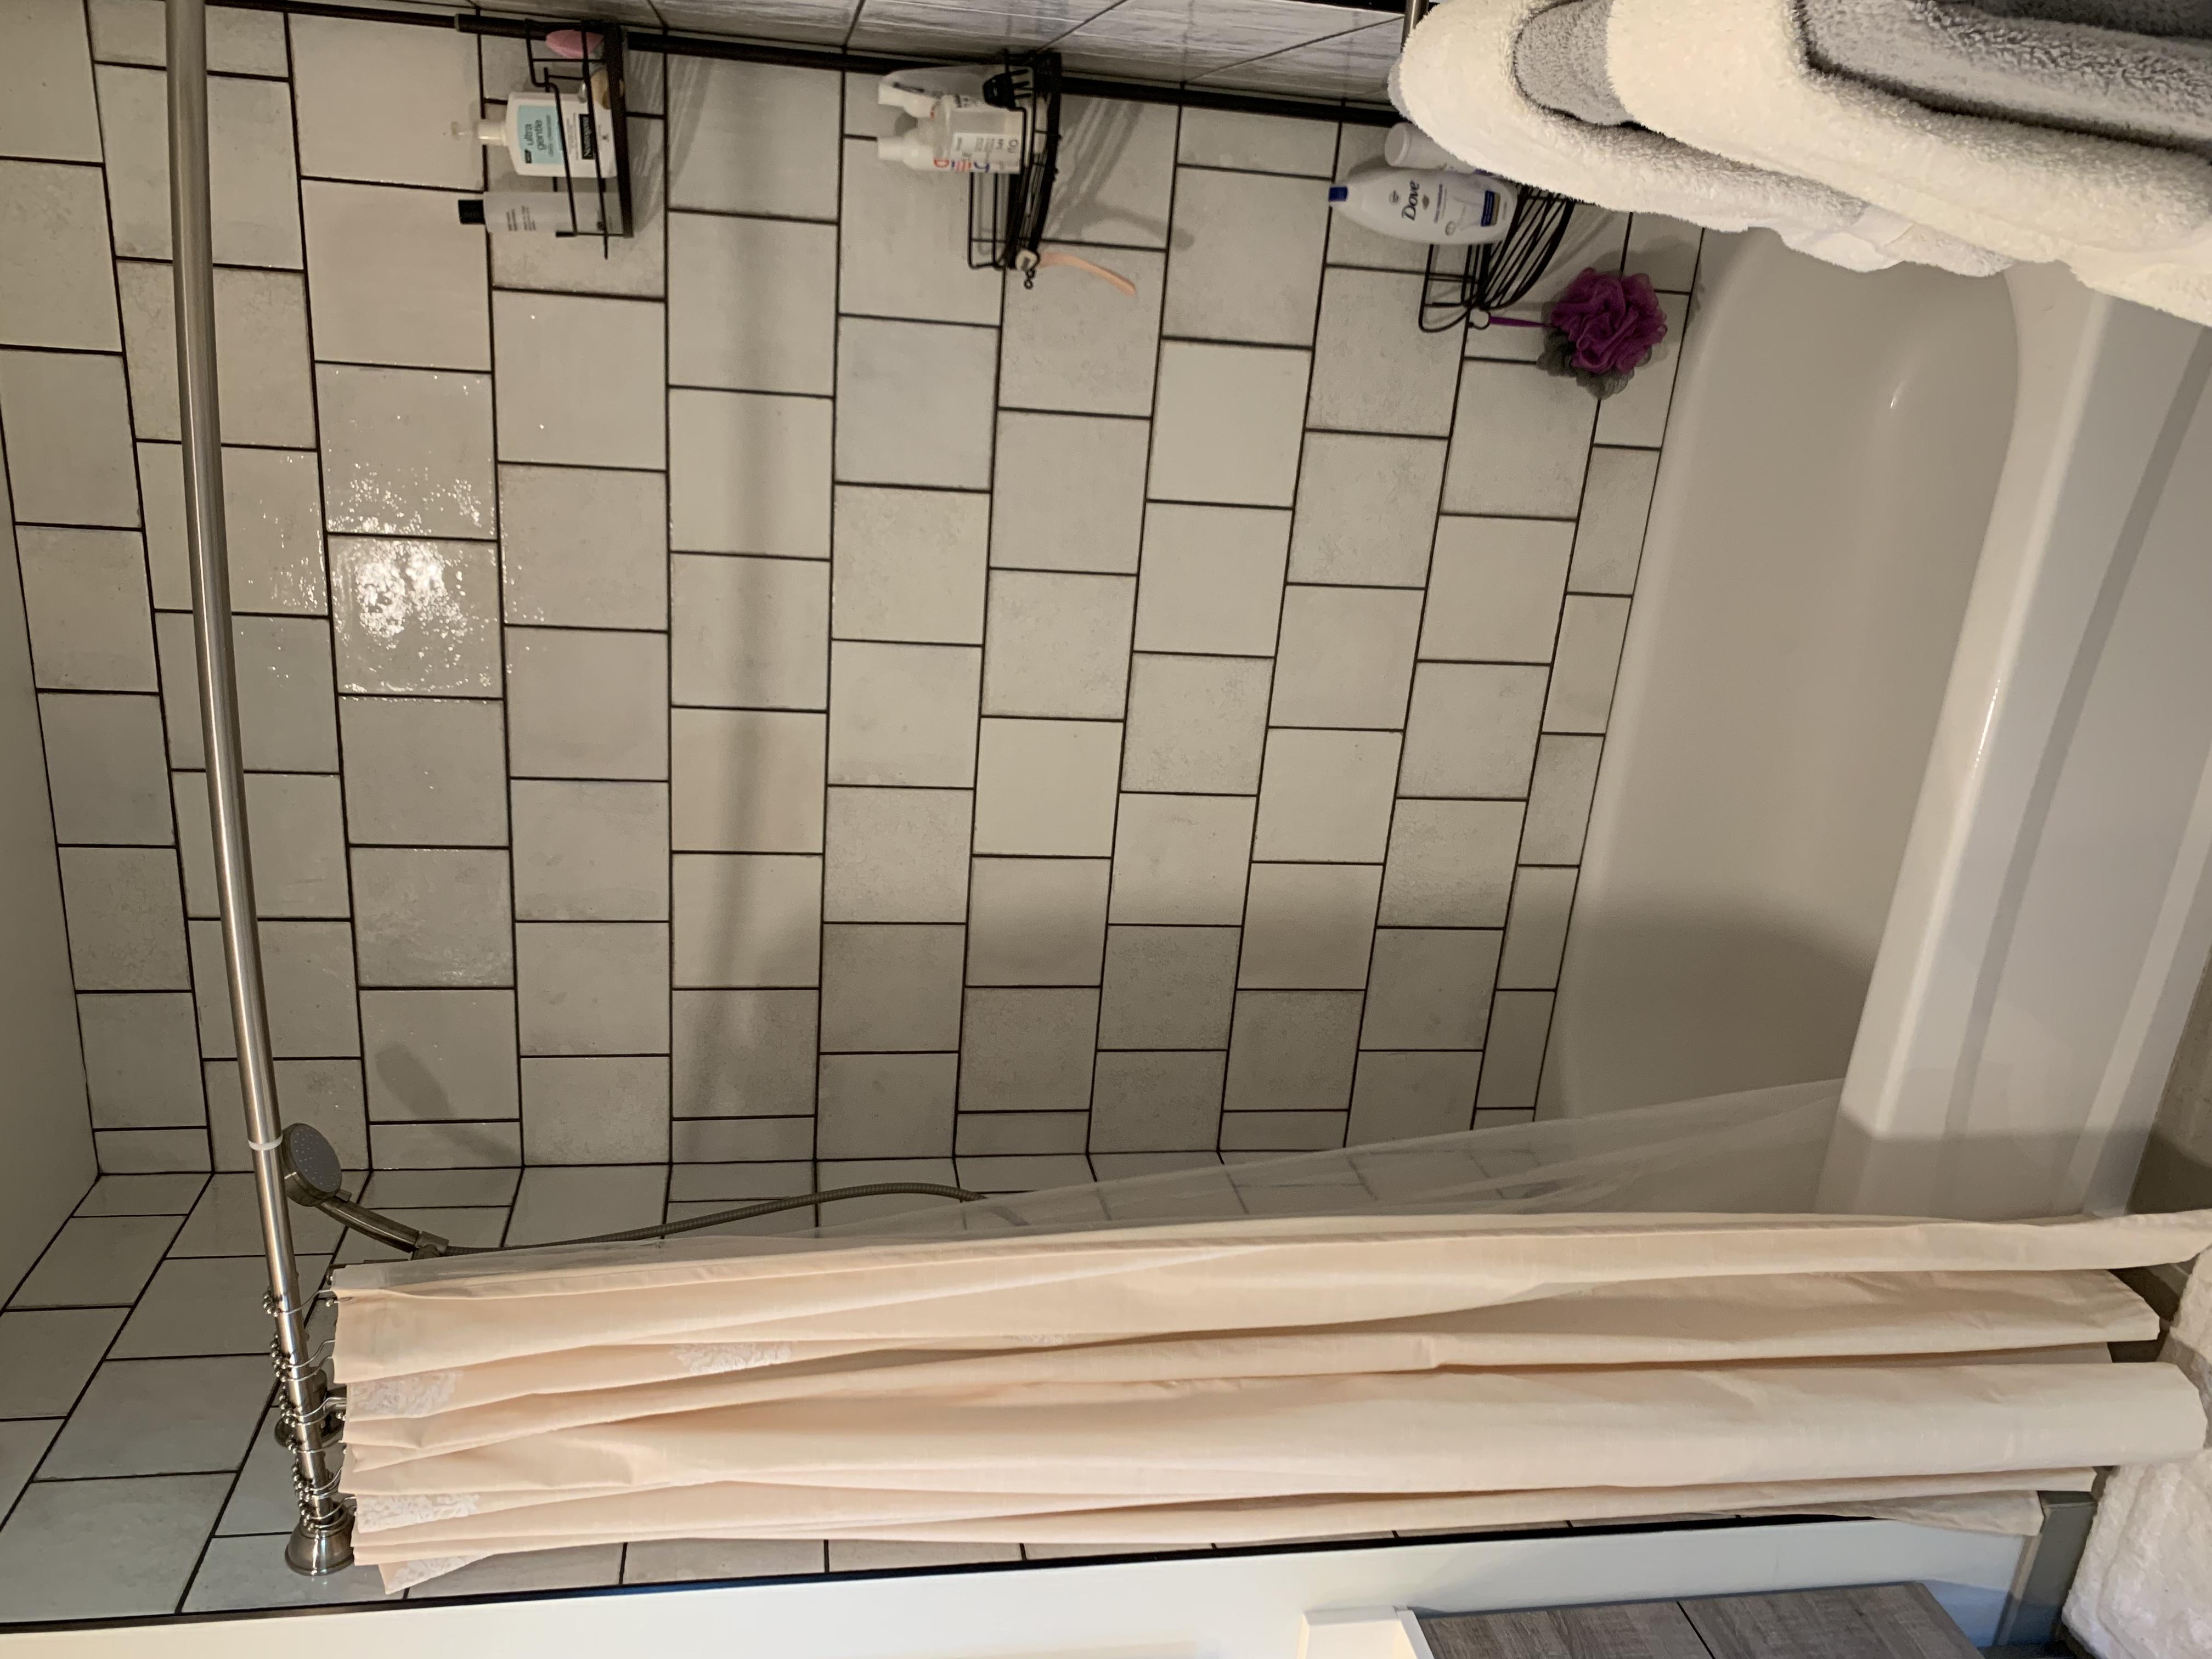 Chicago Sublets and Short Term Apartment & Room Rentals   Flip